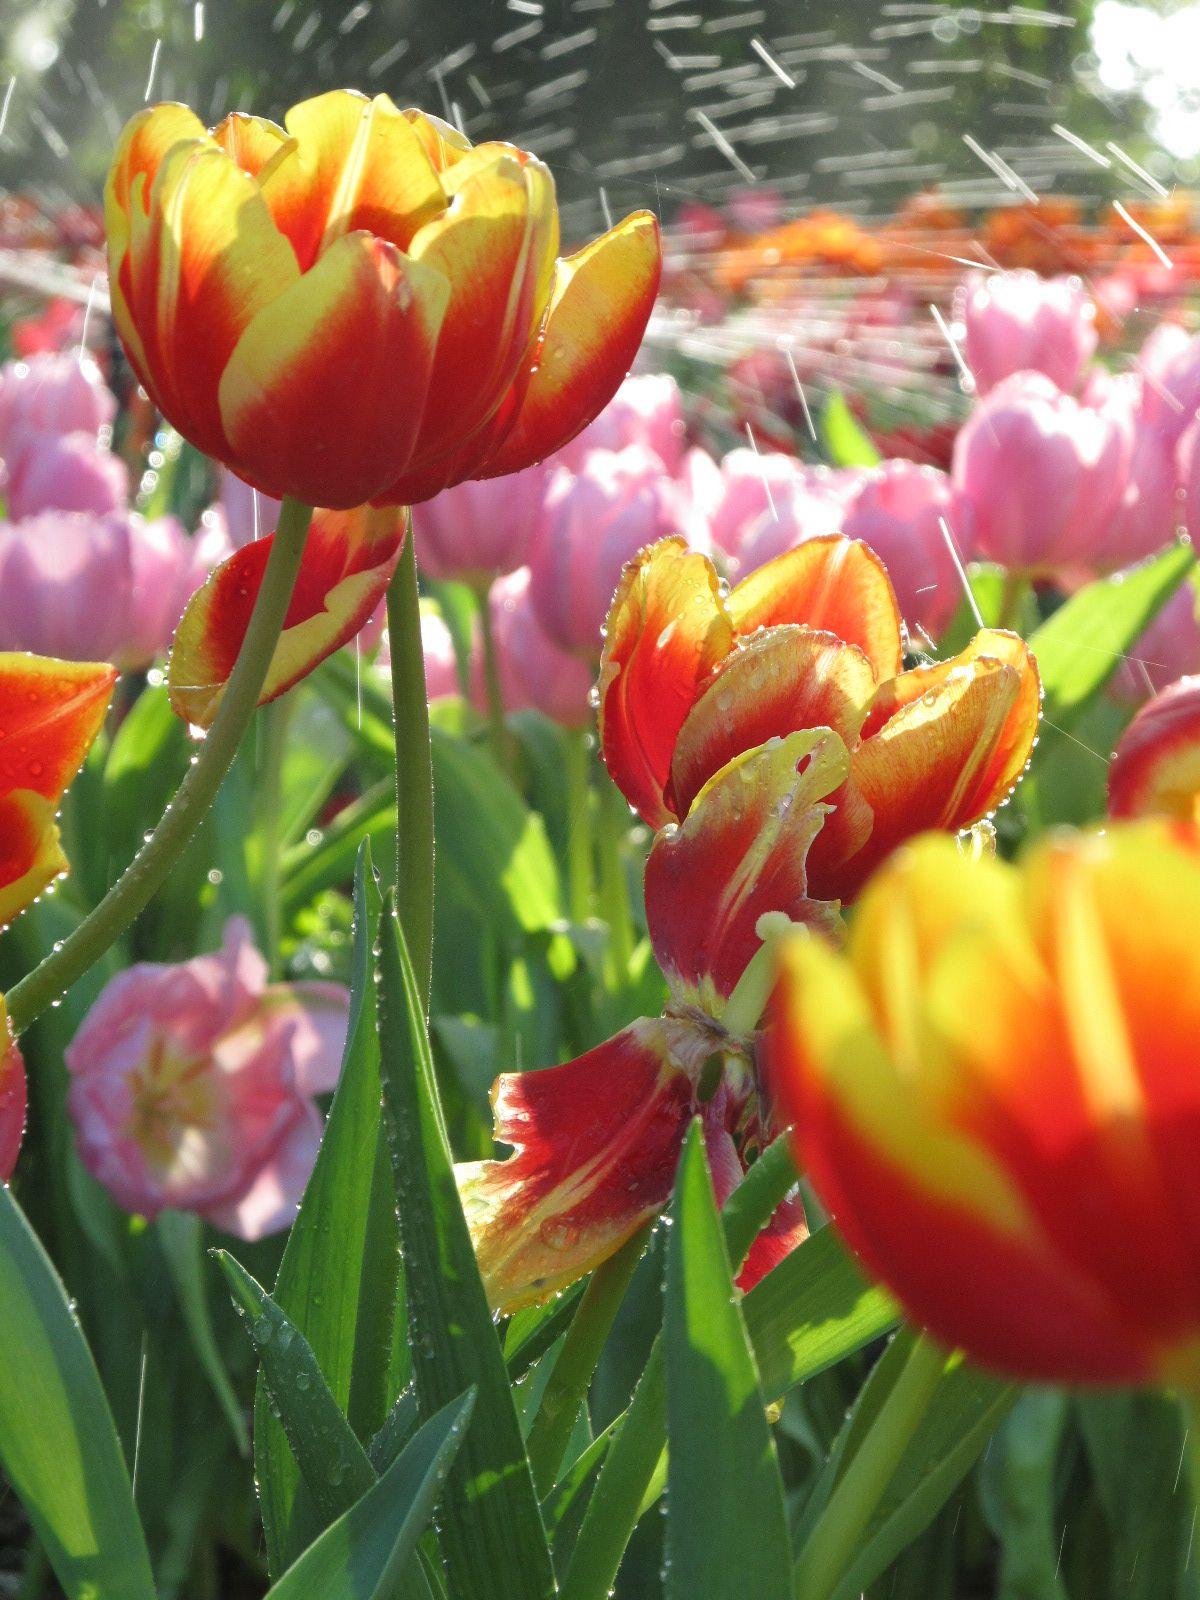 Flowers Similar To Tulips